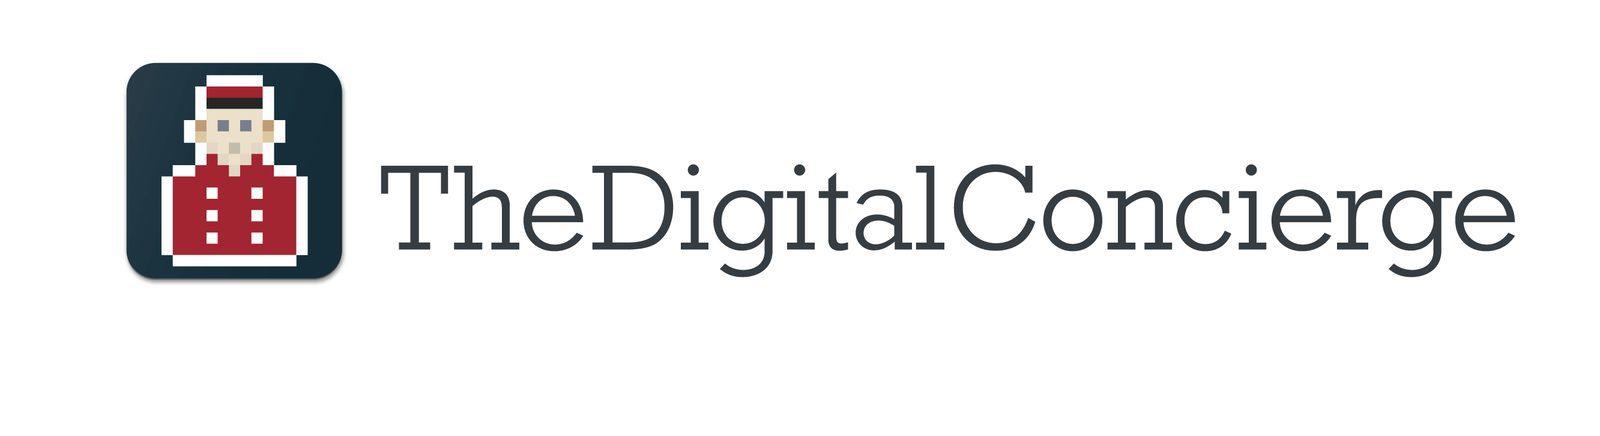 Digitale Concierge 2